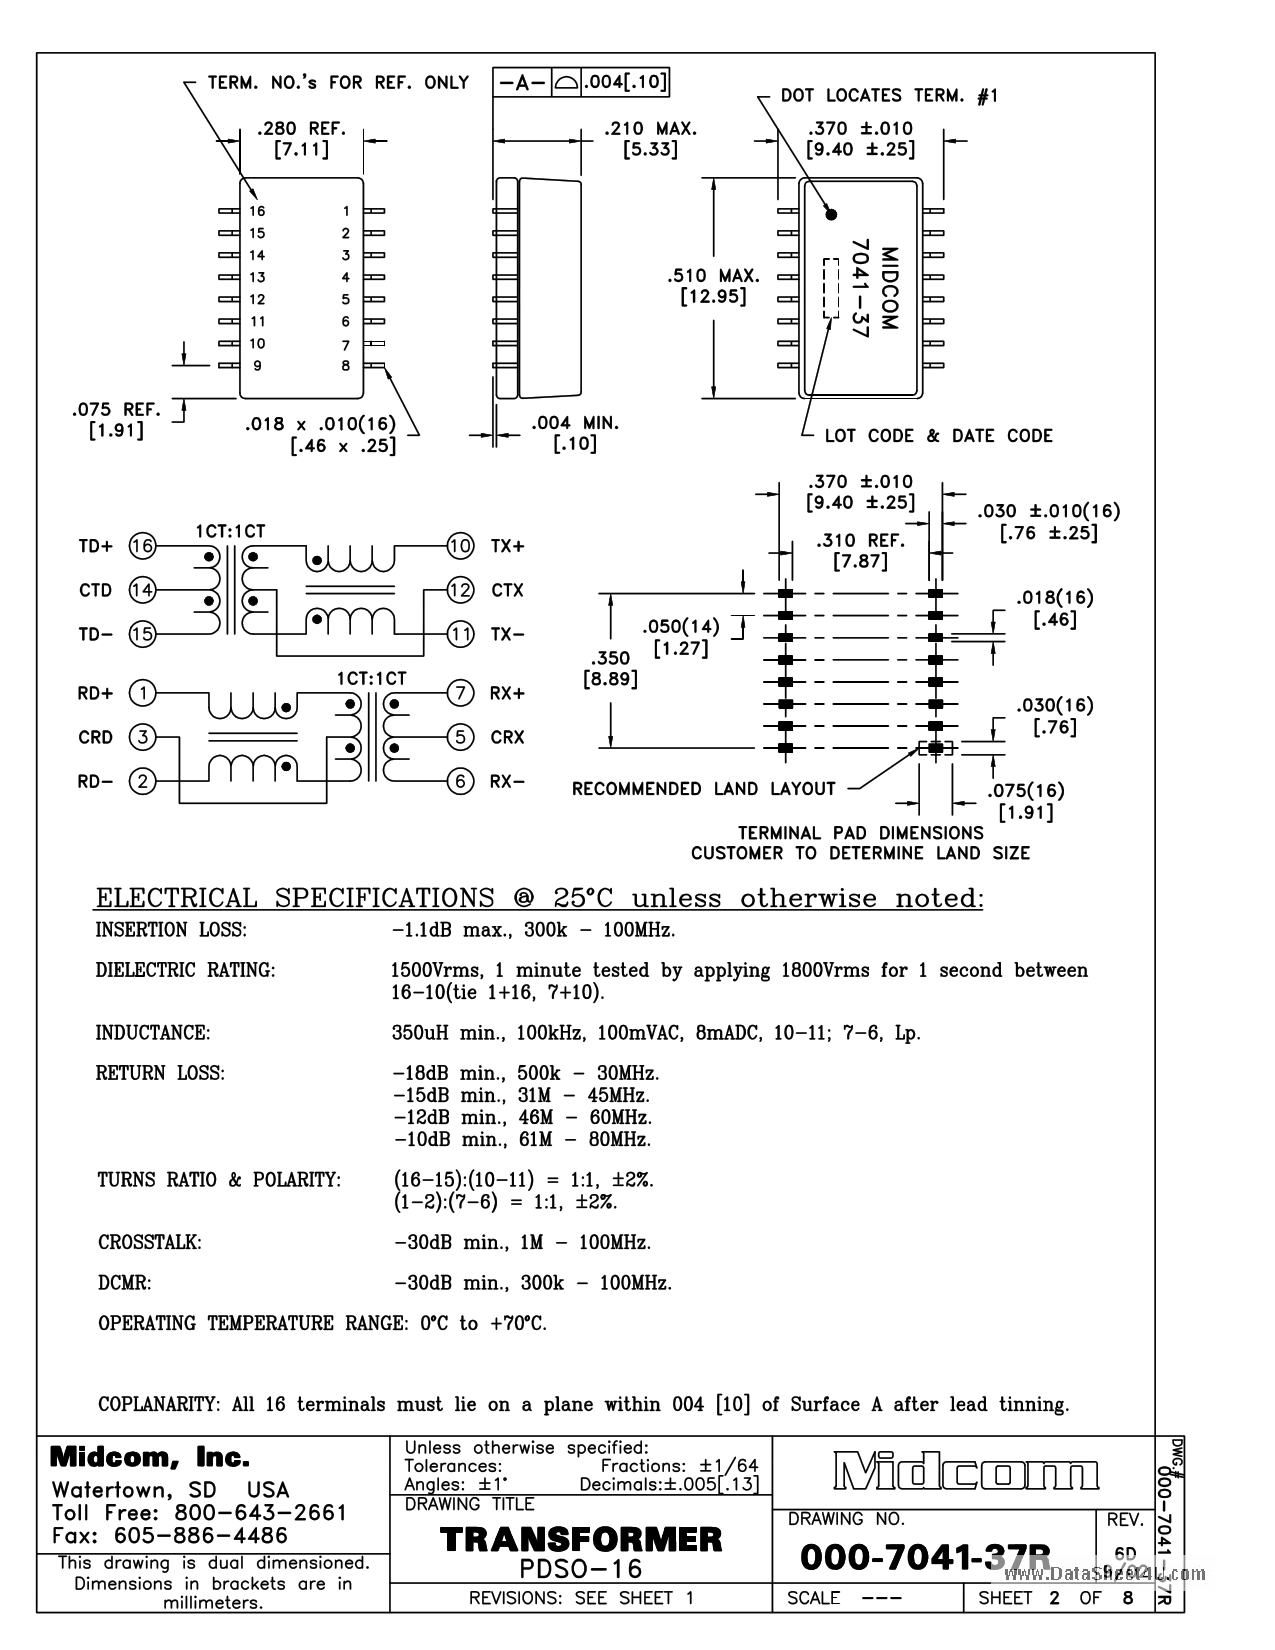 000-7041-37R datasheet